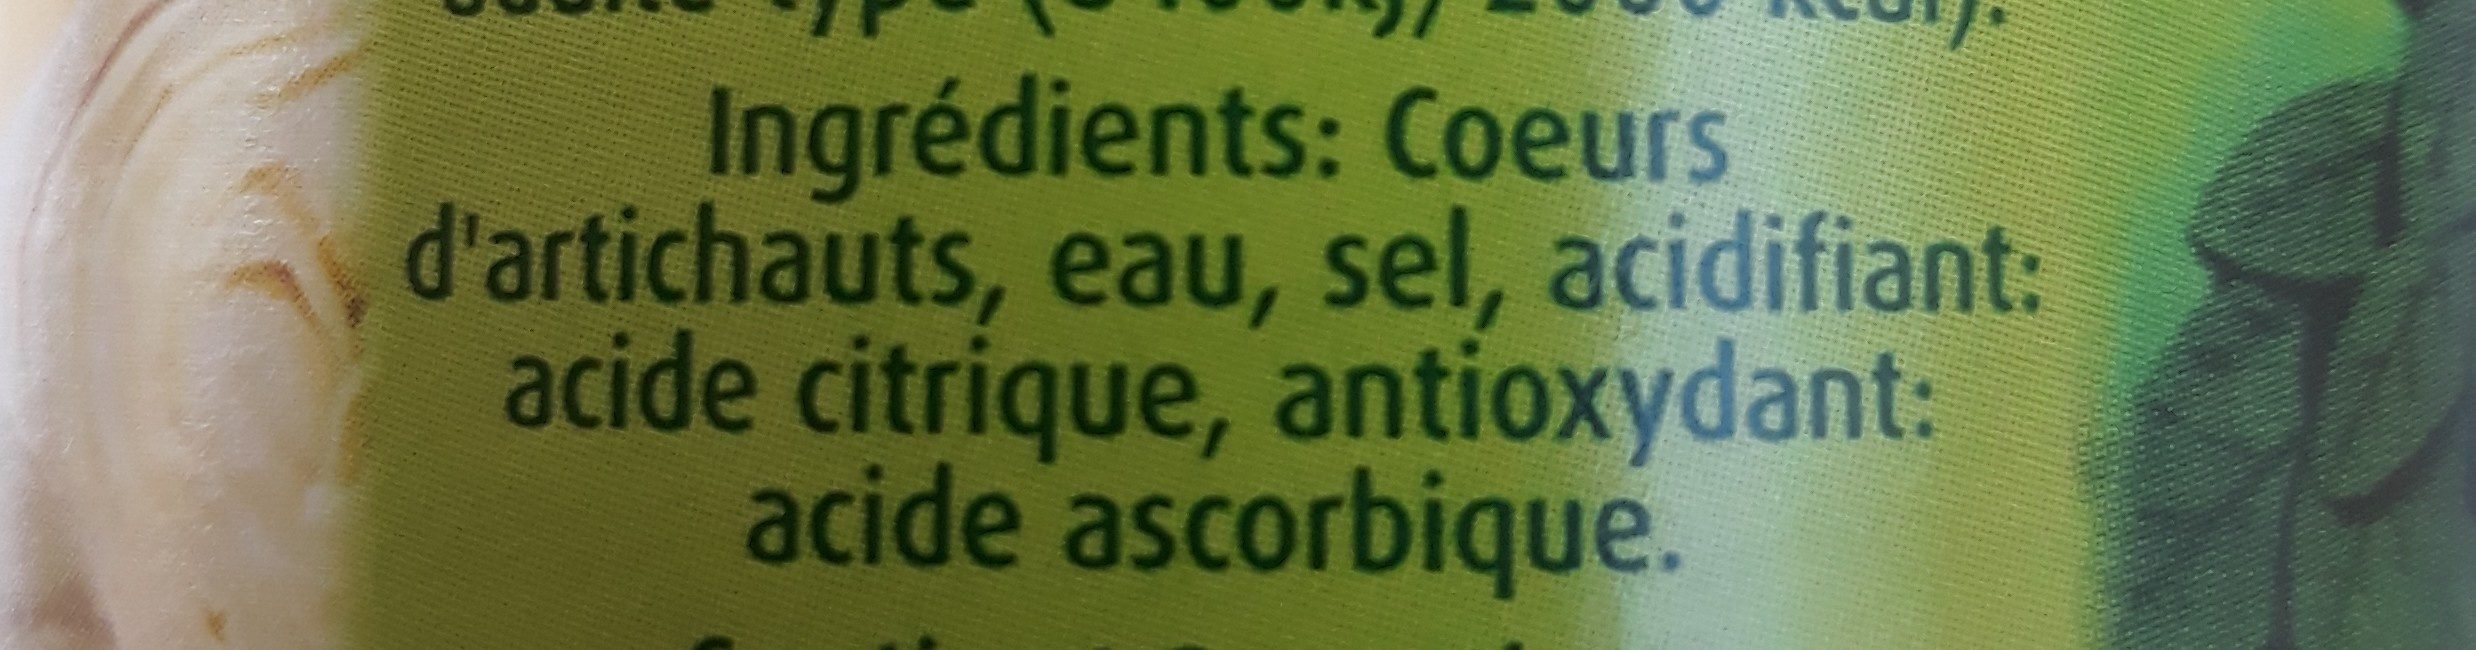 Coeur d'artichaut - Ingrediënten